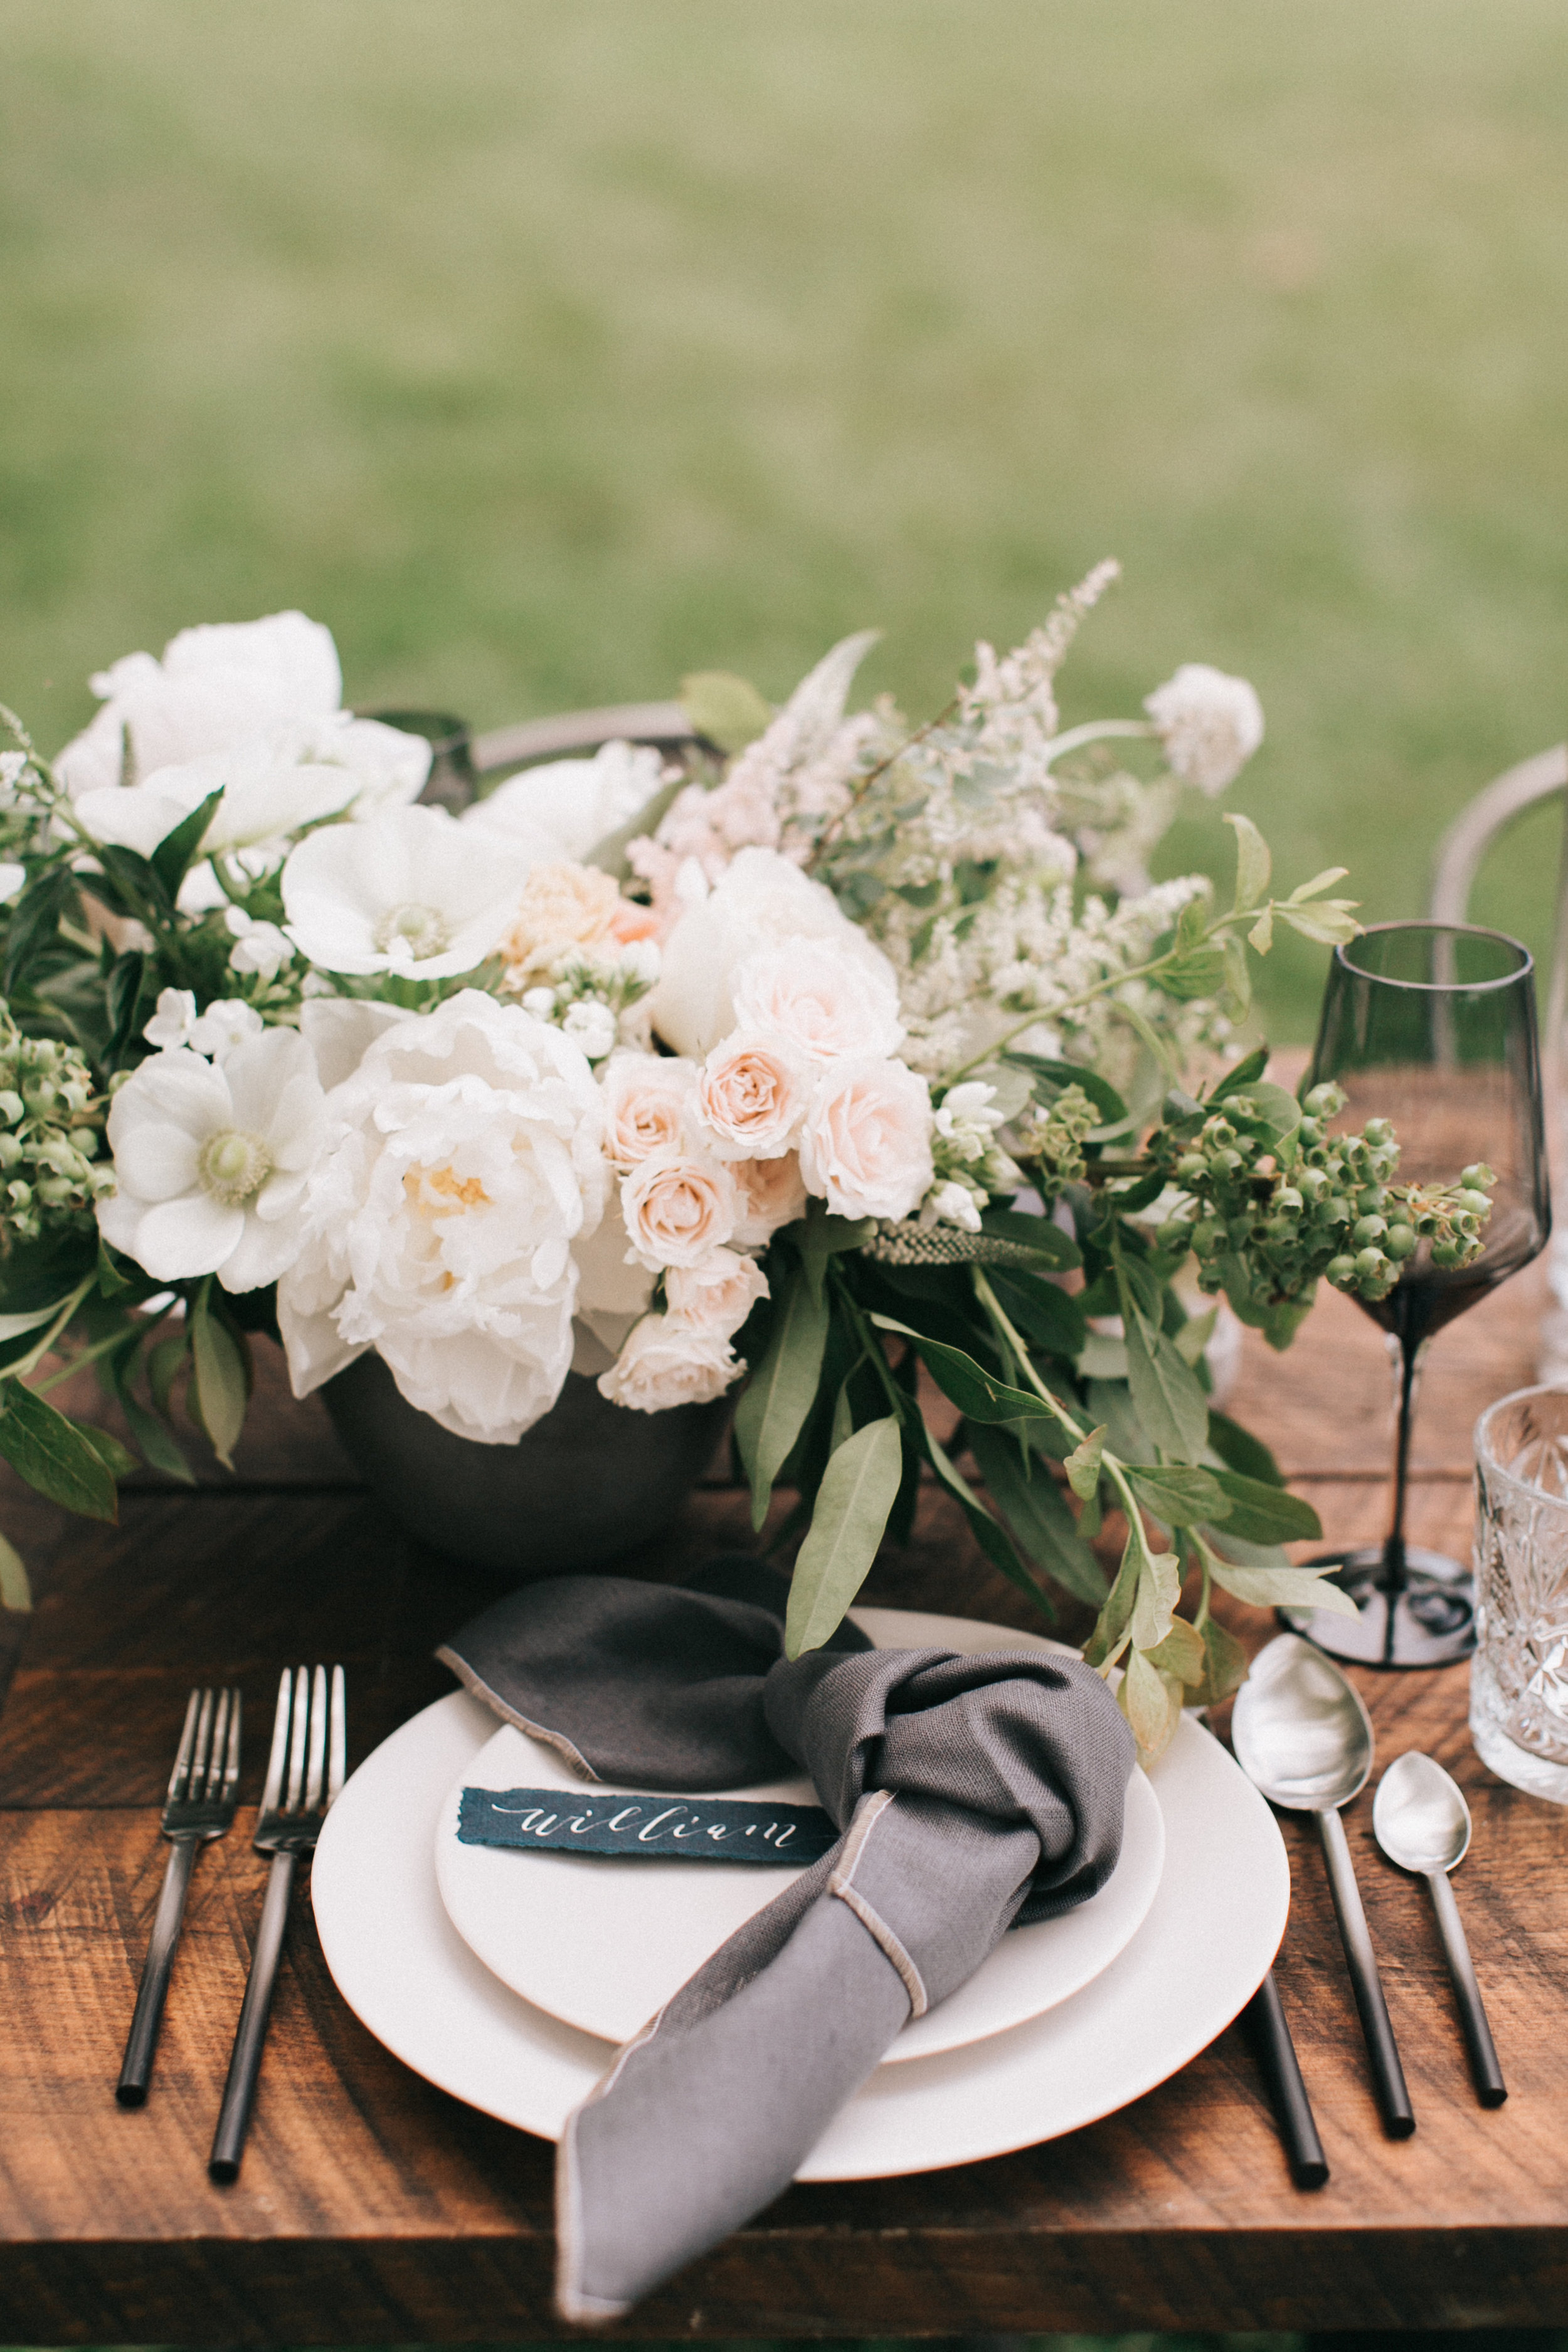 Watershed-Floral-Maine-Maritime-Wedding-Bridal-Bouquet-Centerpieces-0038.jpg